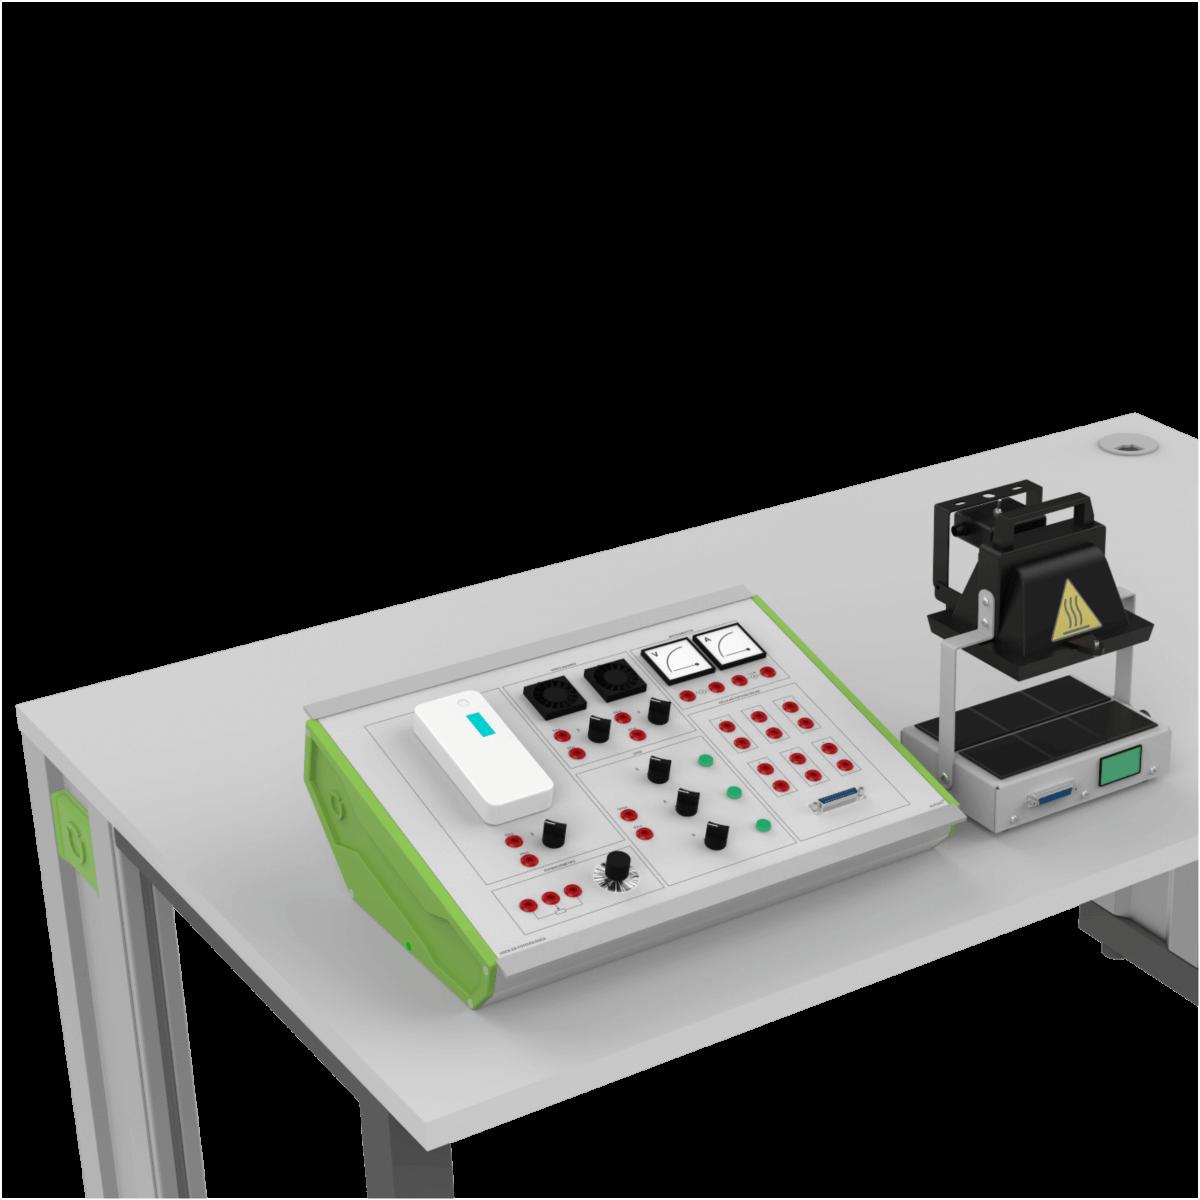 bancada-didatica-dock-station-energia-fotovoltaica-auttom-4